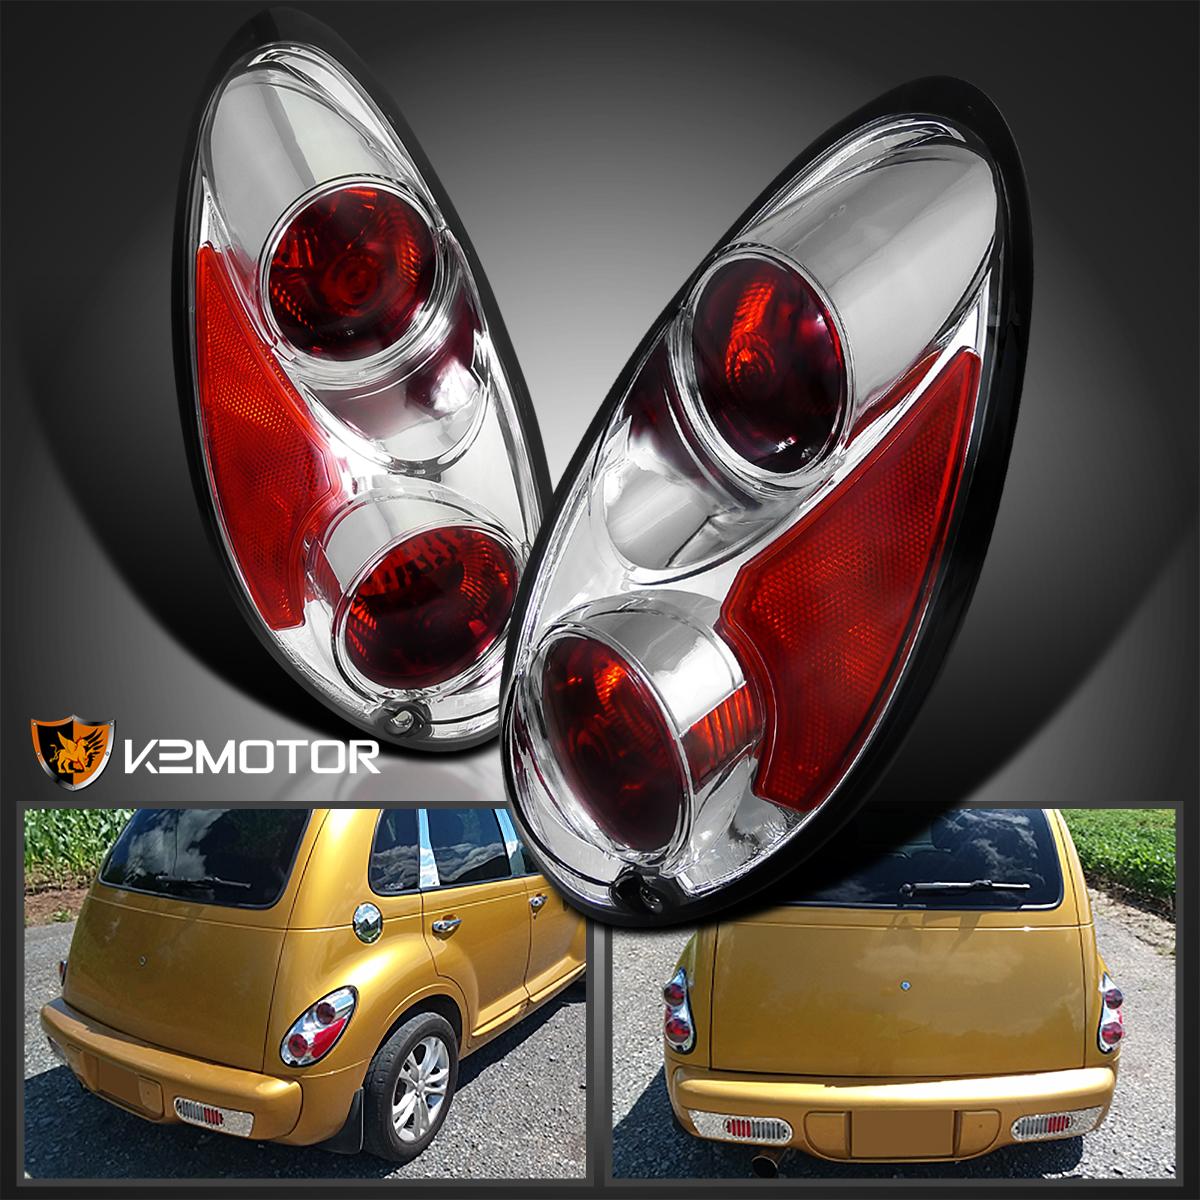 01 05 chrysler pt cruiser chrome tail lights rear lamps ebay. Black Bedroom Furniture Sets. Home Design Ideas